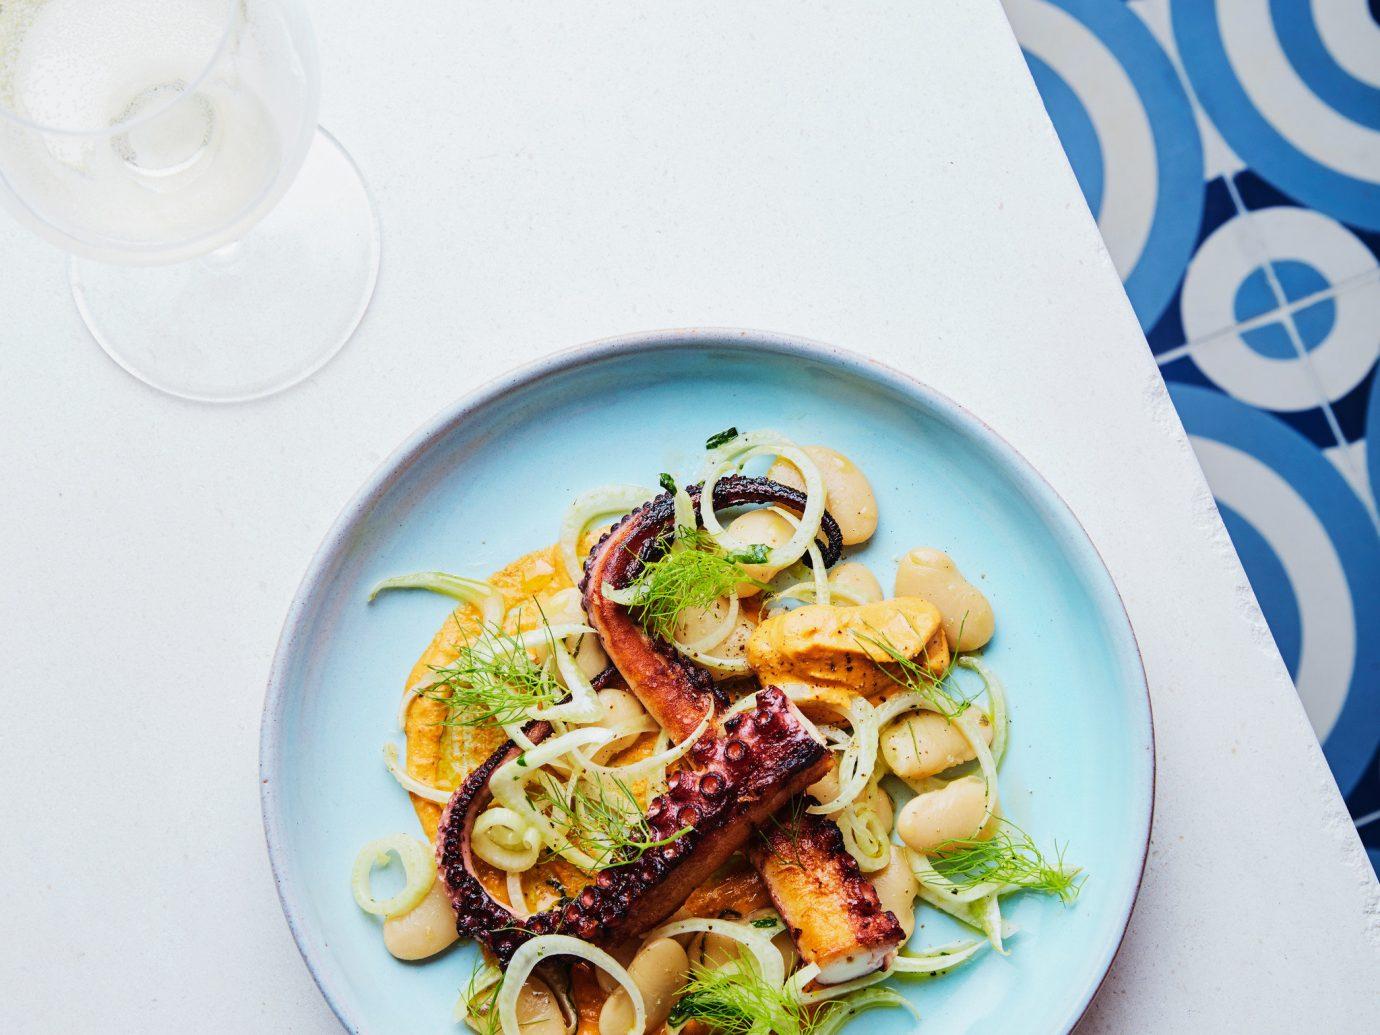 NYC Trip Ideas plate food dish cuisine vegetarian food italian food european food vegetable recipe meal